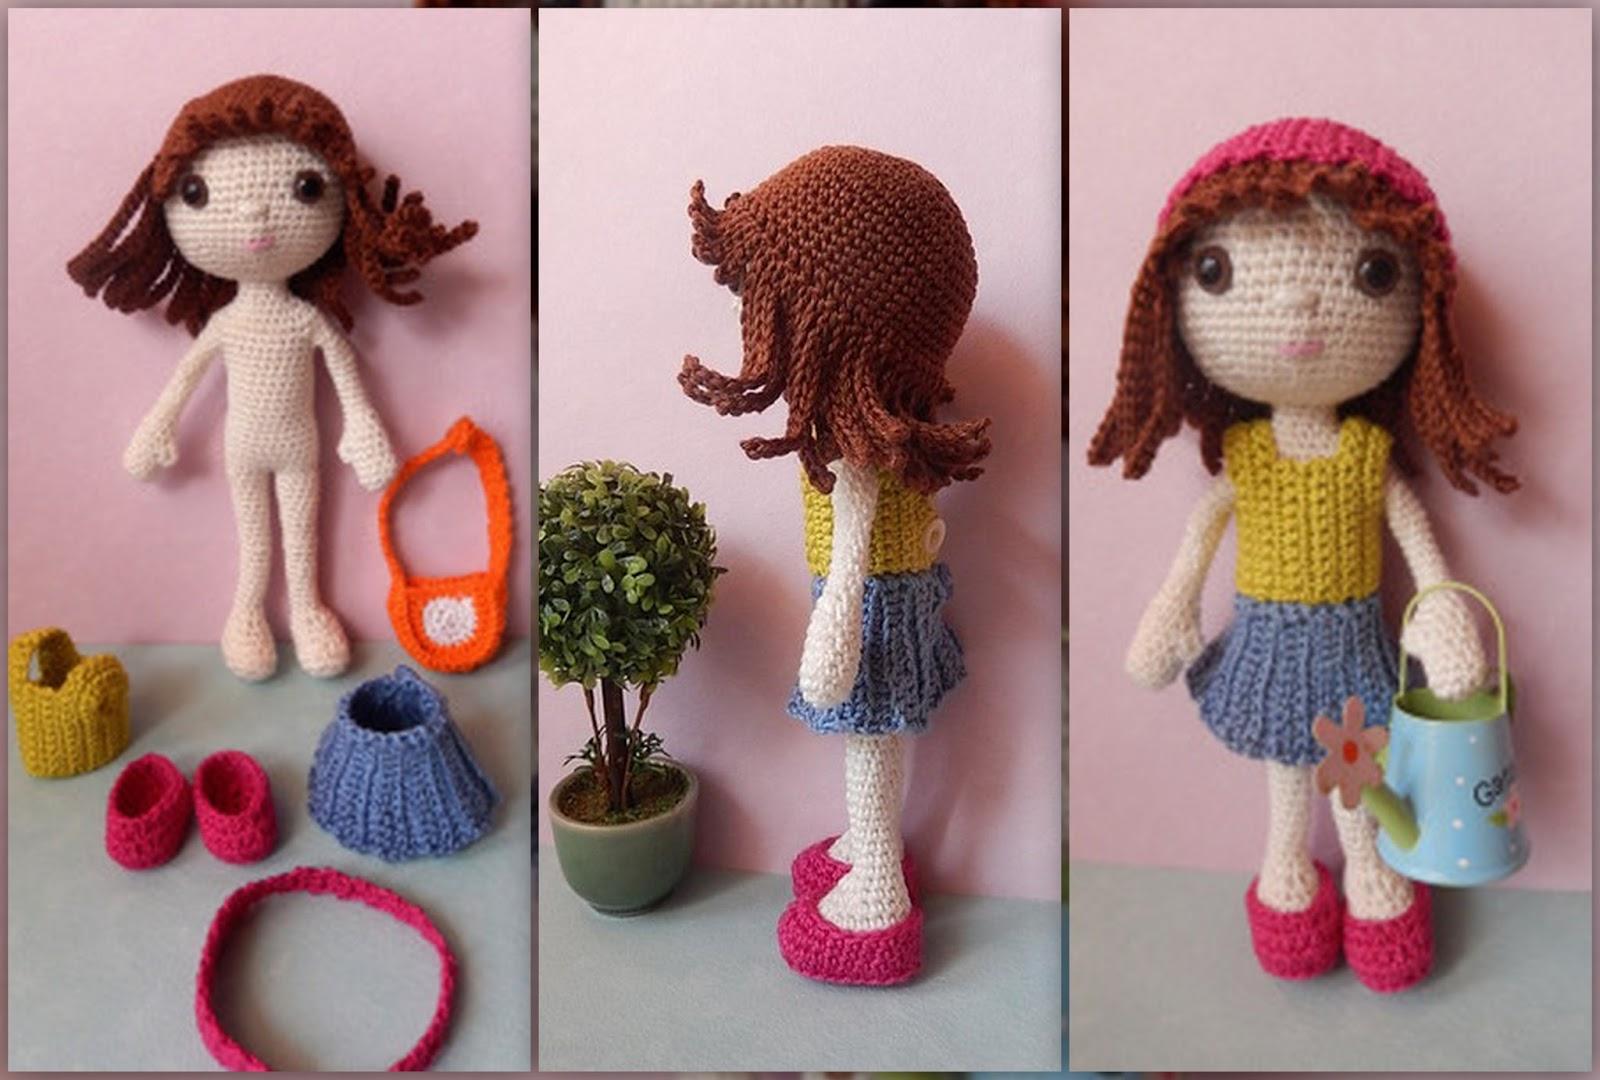 40 Crochet Doll Patterns (Clothing & Accessories)   AllFreeCrochet.com   1080x1600